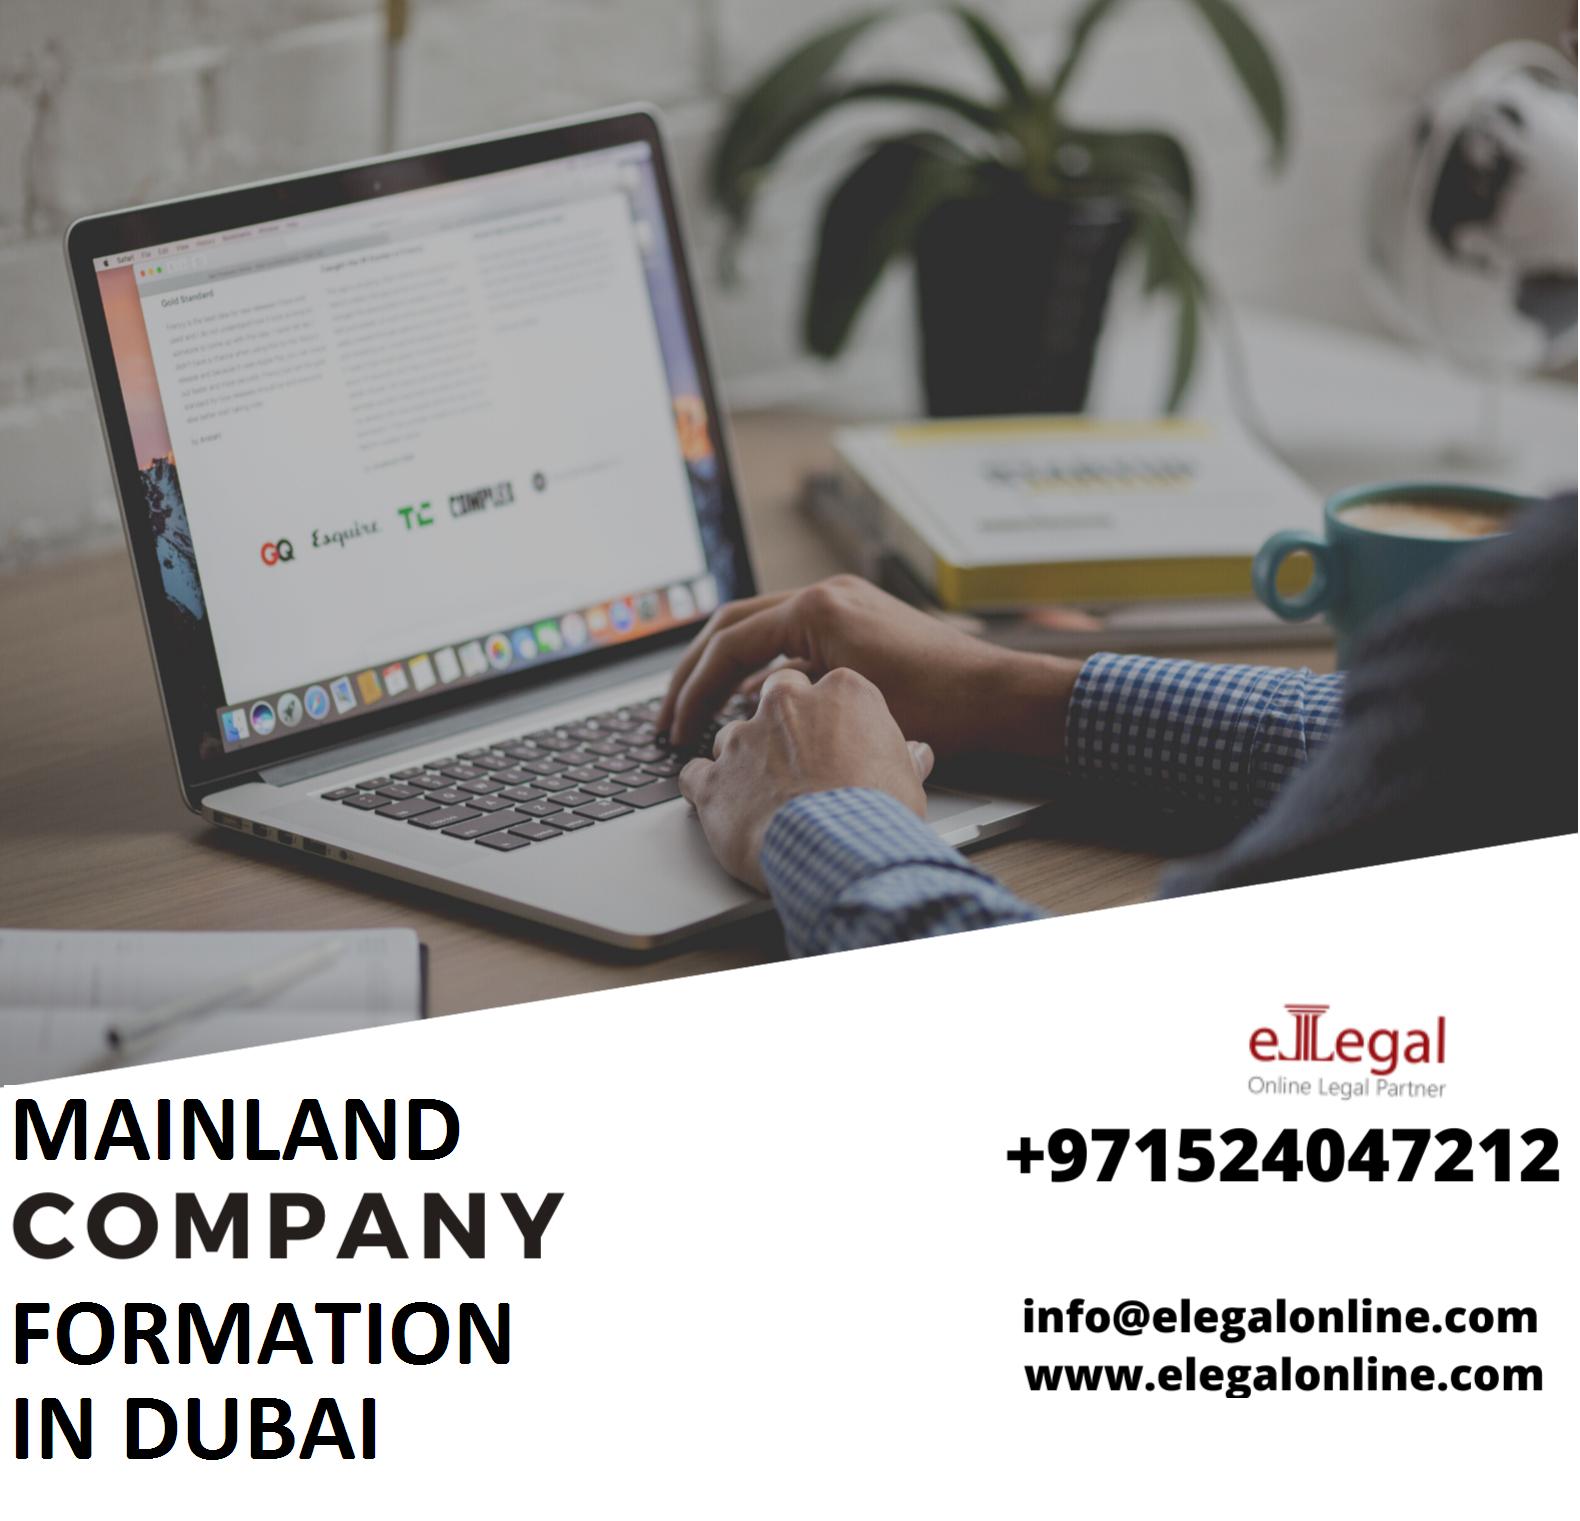 Mainland Company Formation In Dubai UAE